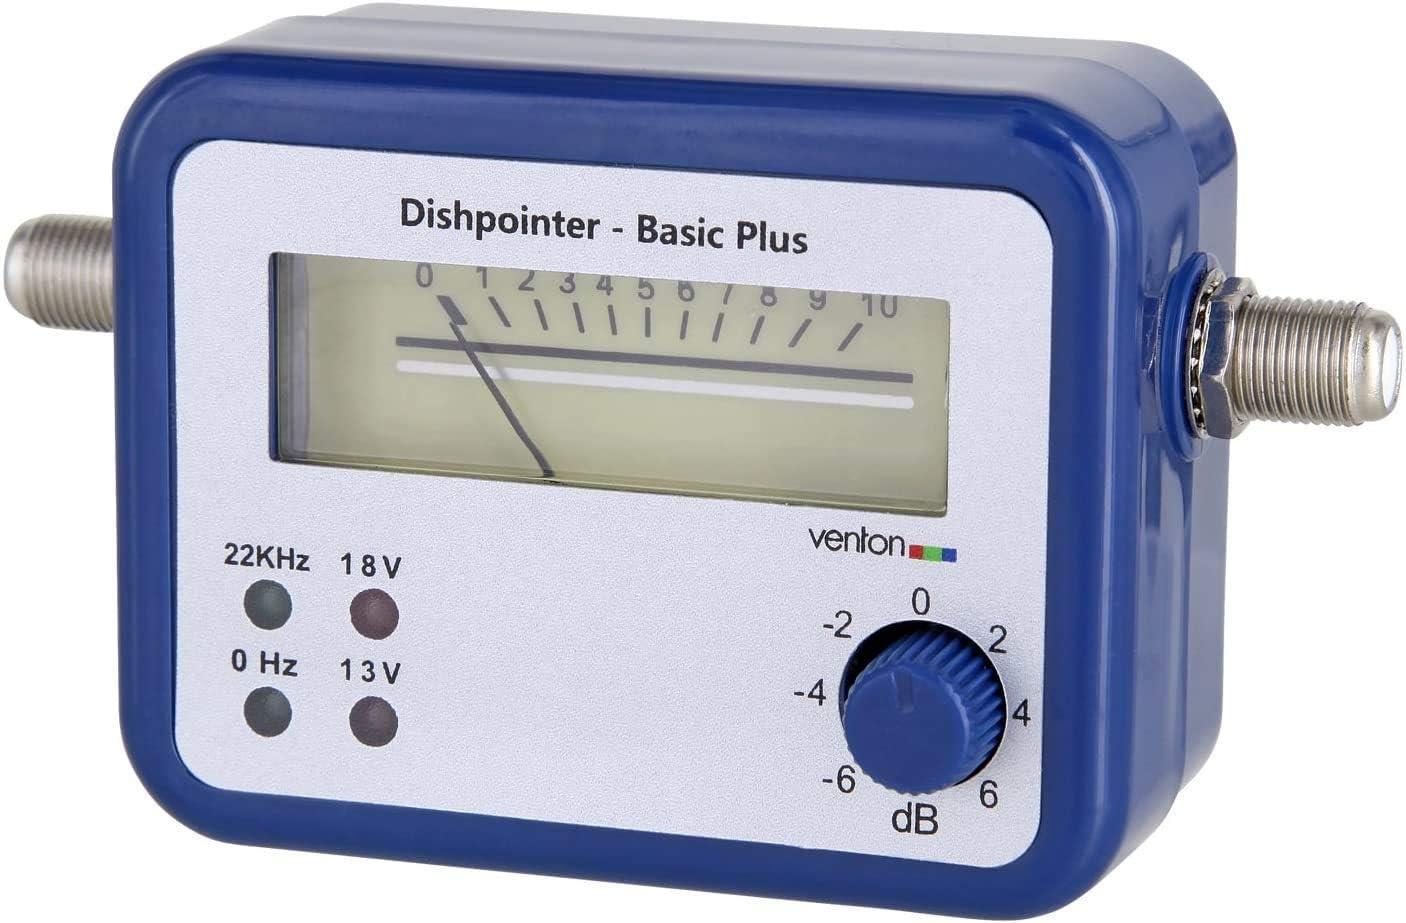 Venton Dishpointer, Basic Pro localizador de señal satélite